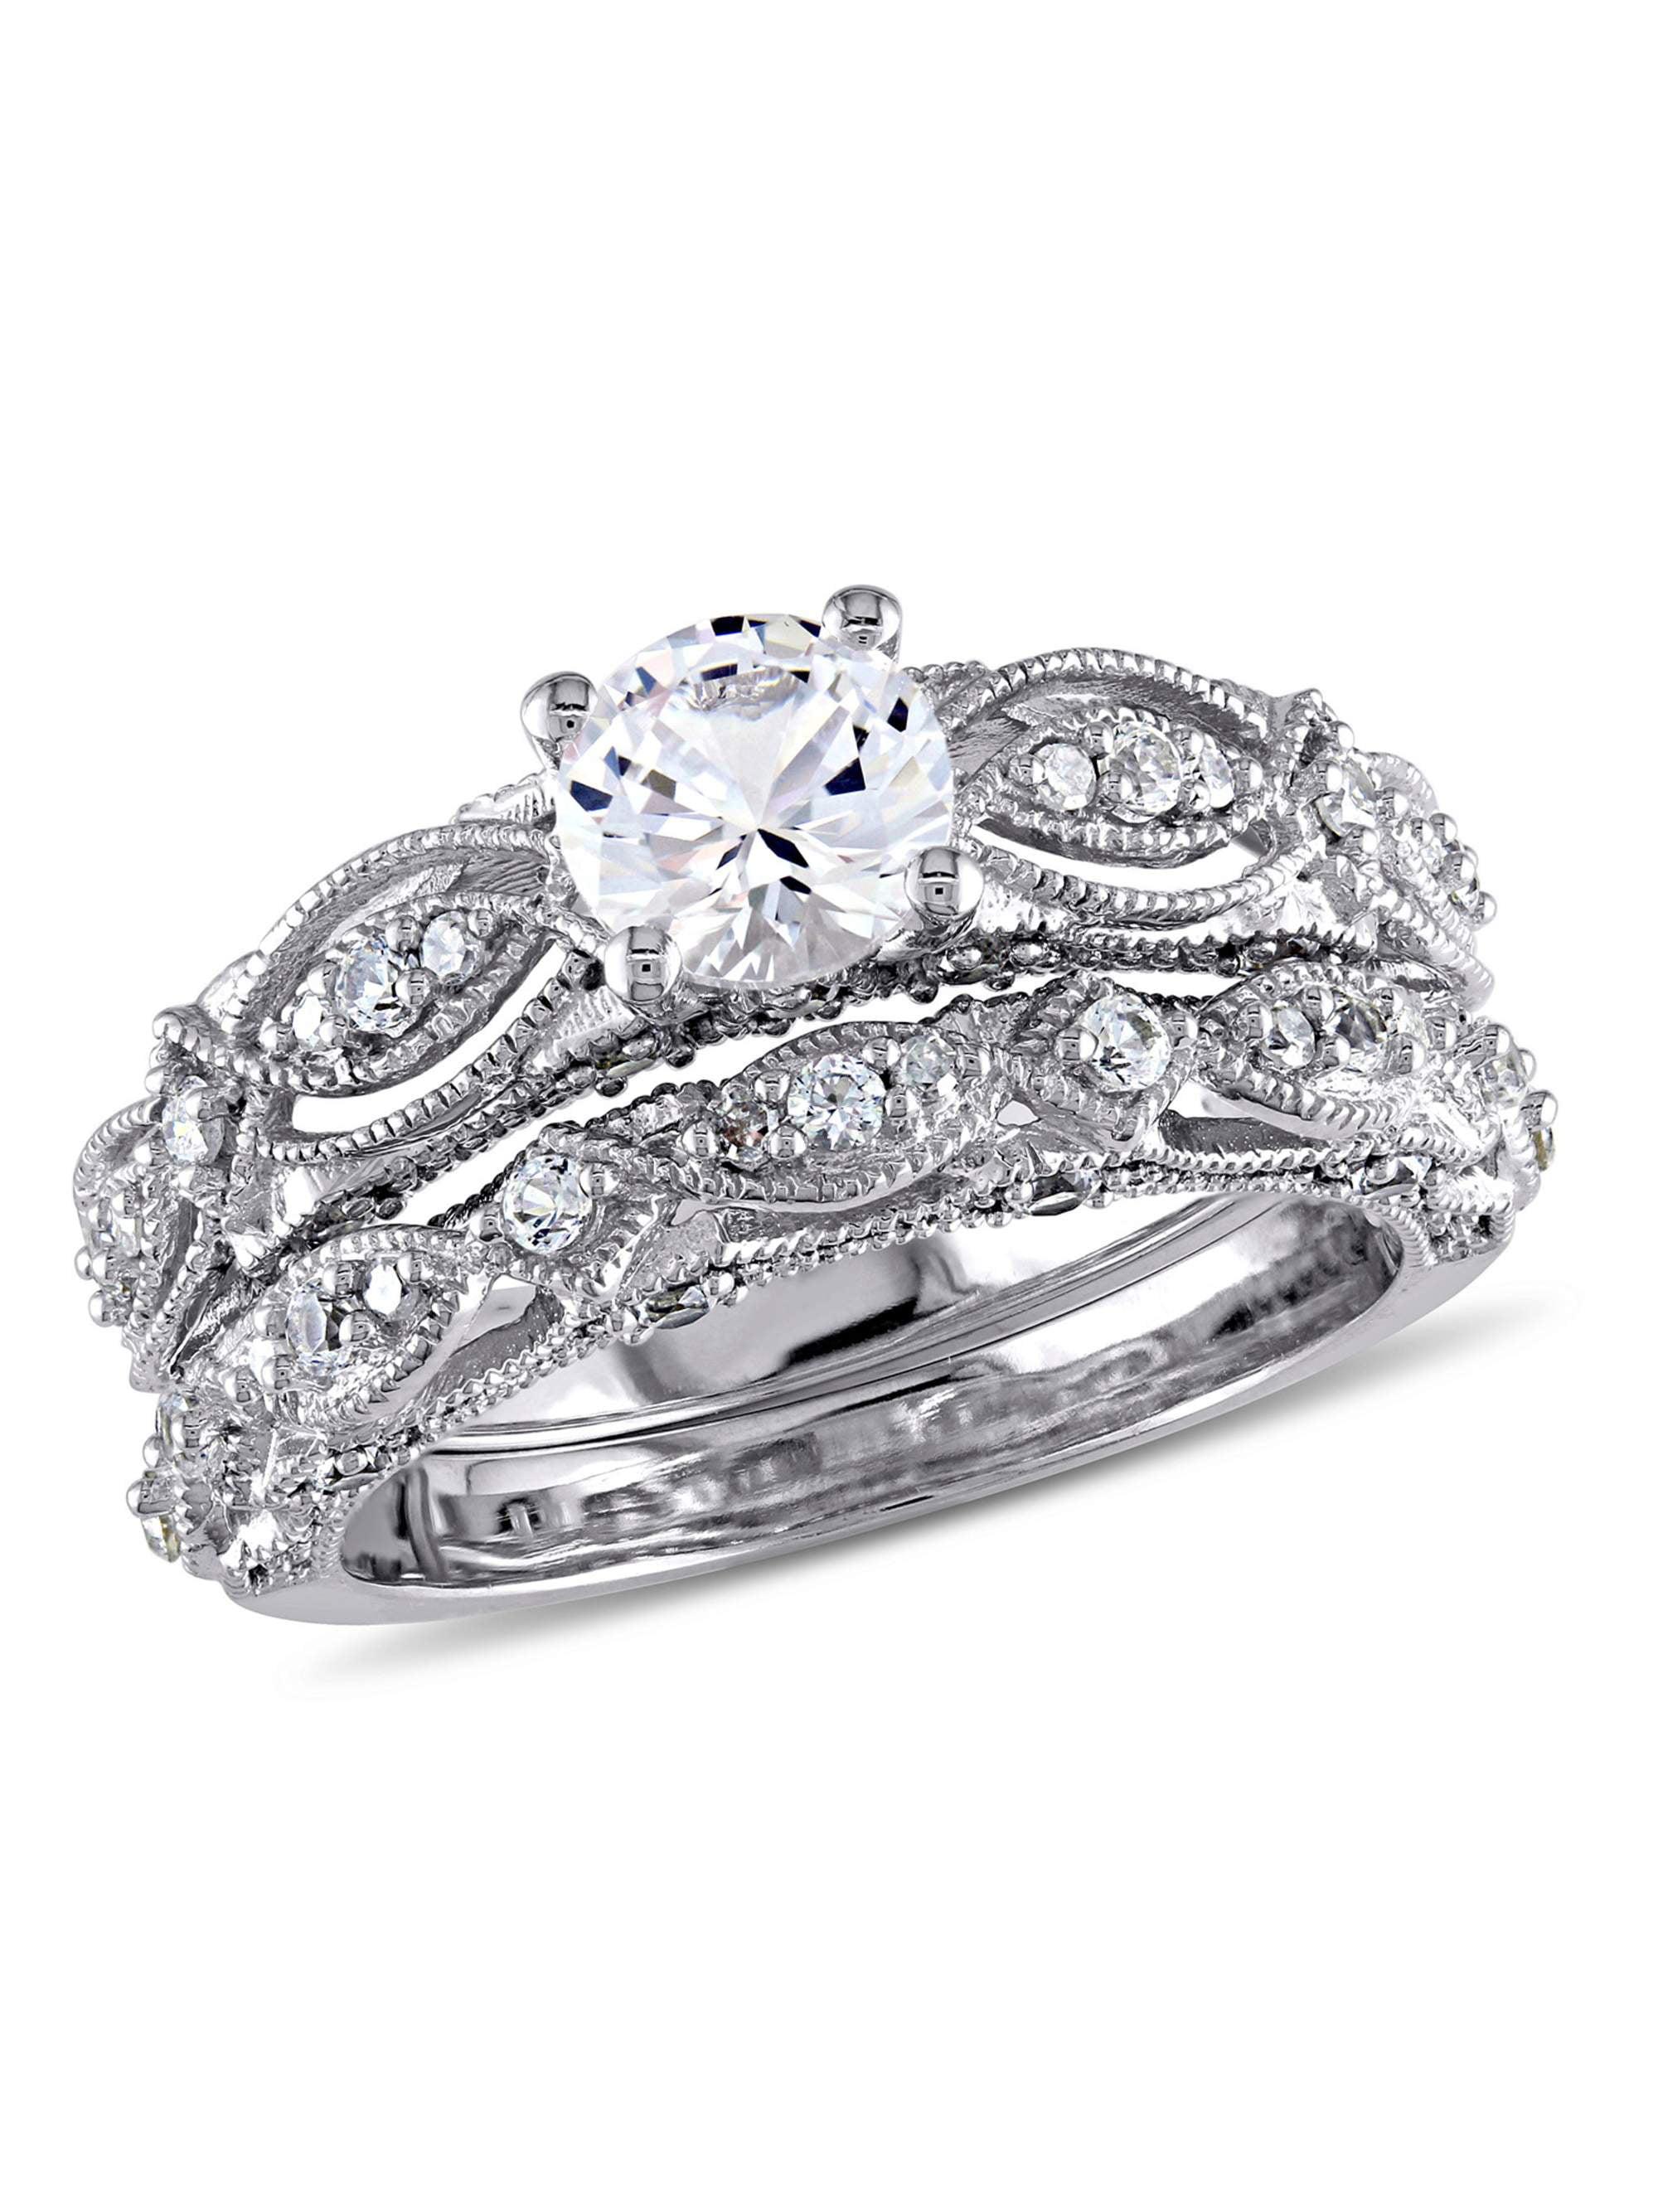 Miabella 1-3 4 Carat T.G.W. Created White Sapphire and 1 10 Carat T.W. Diamond 10kt White Gold Vintage Bridal Set by Delmar